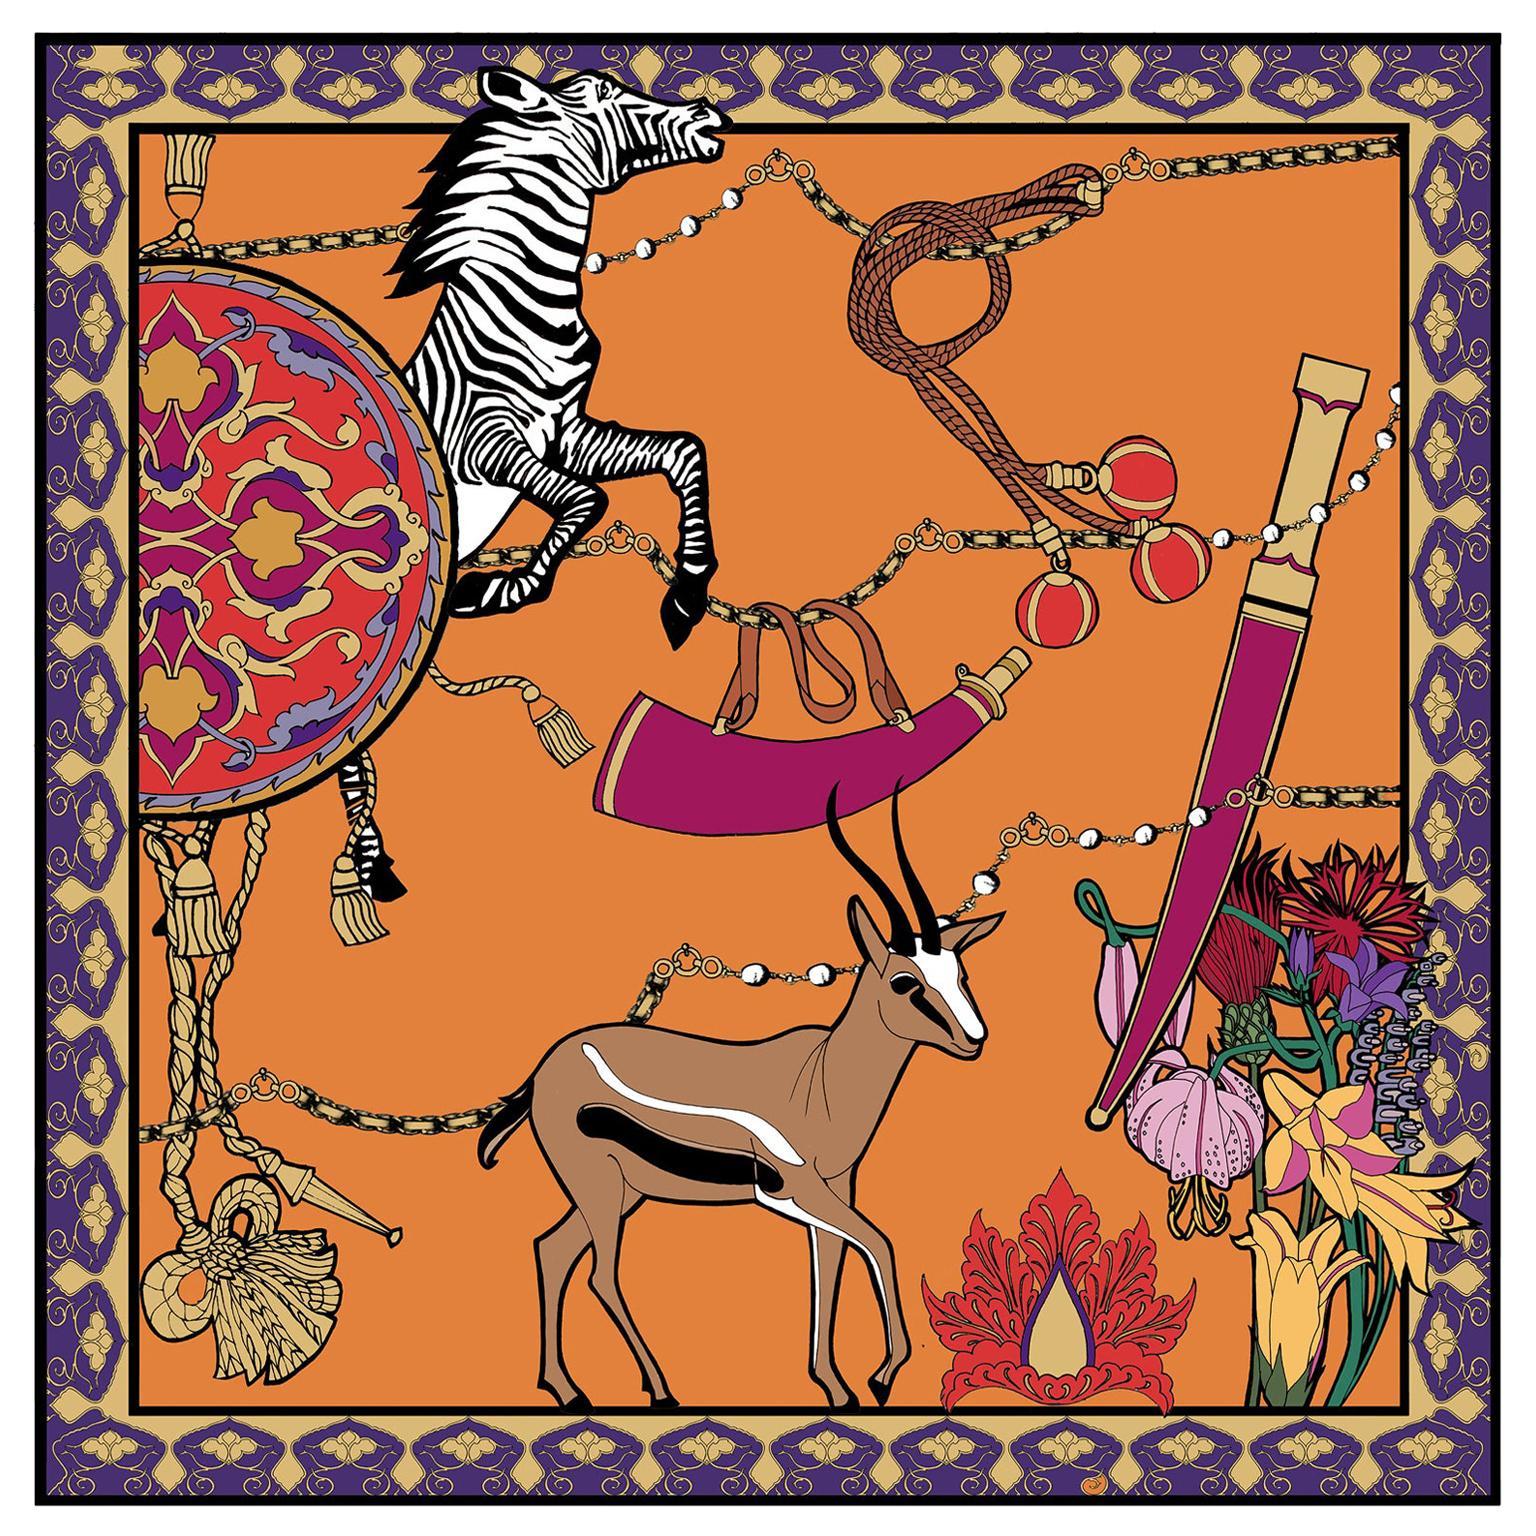 Les Ottomans Zebra & Gazelle Patterned Silk Turkish Scarves by Alessio Nessi